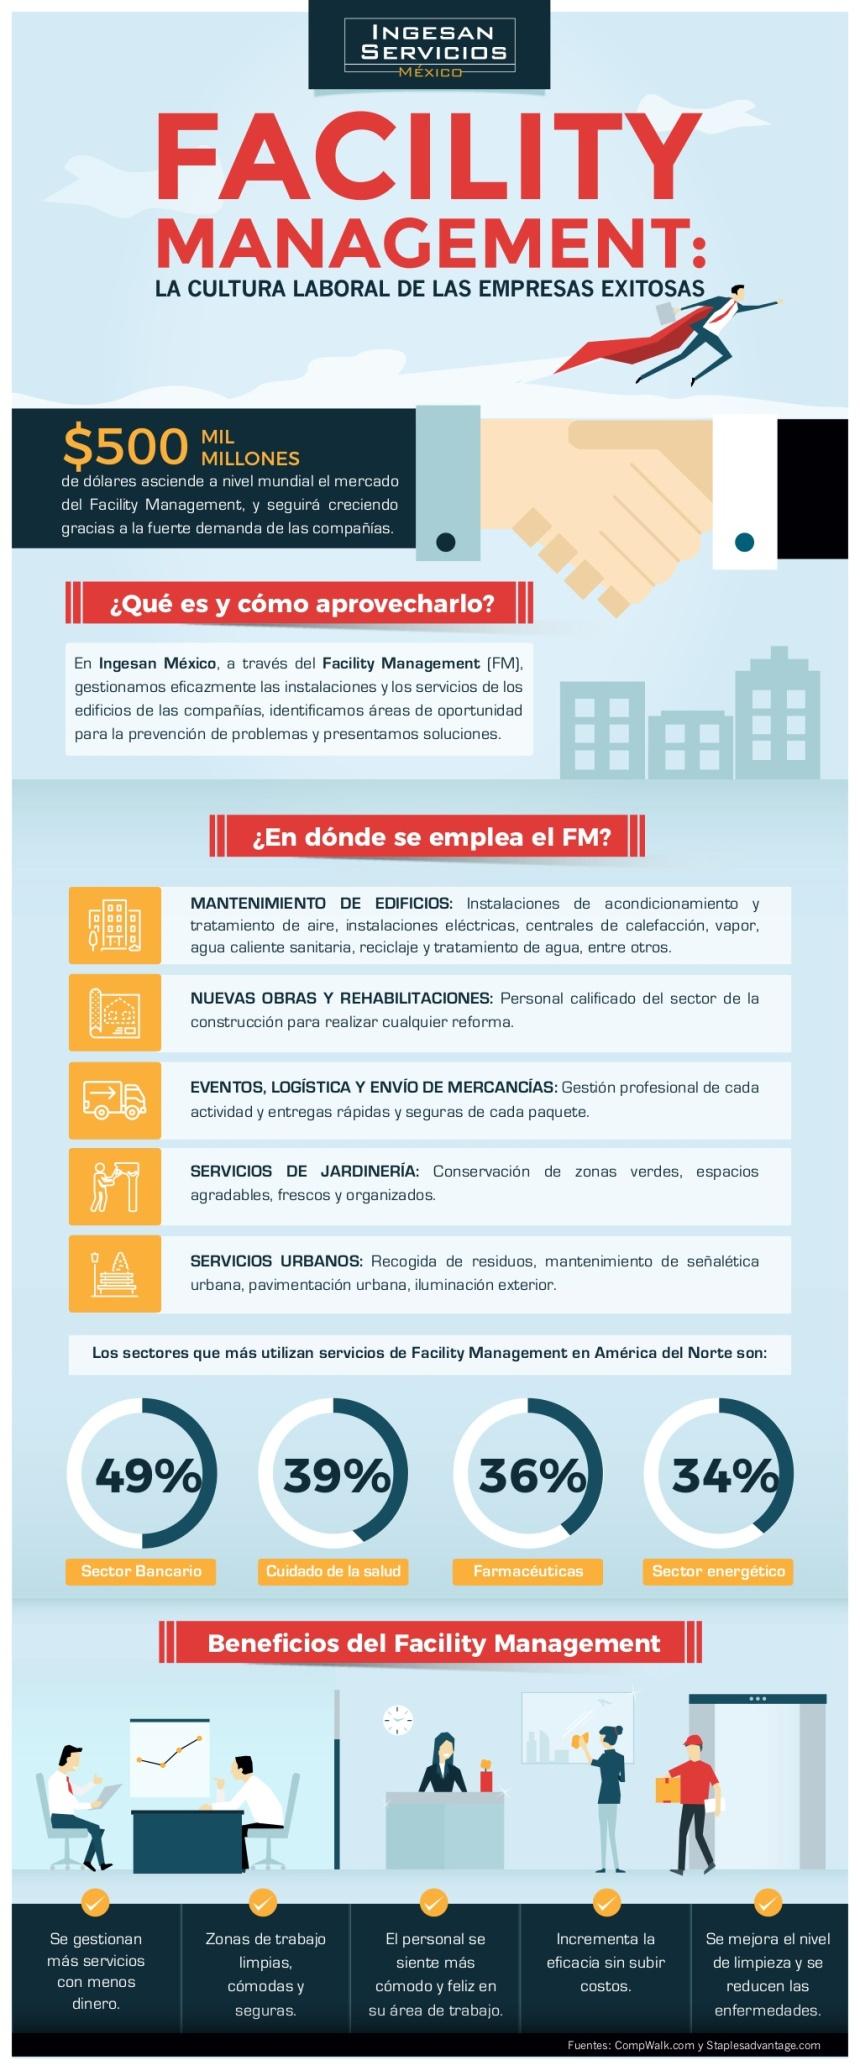 Facility Management:La cultura de las empresas exitosas